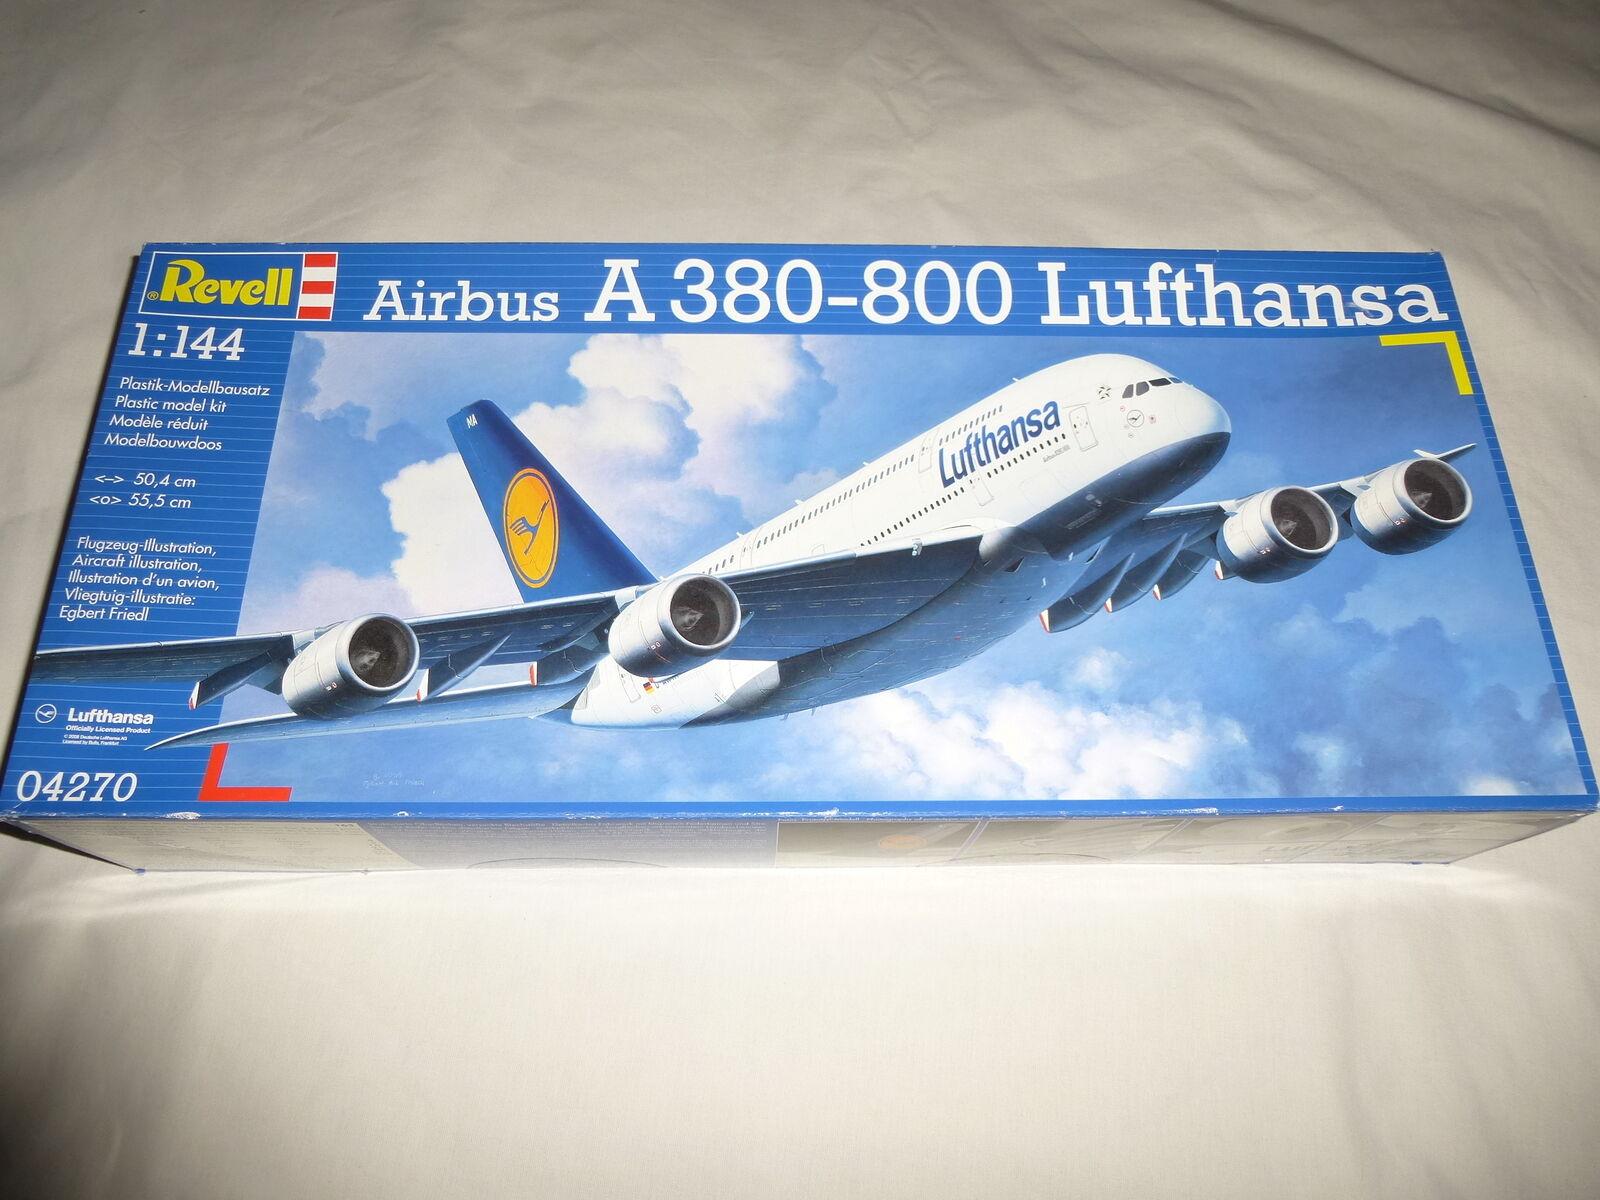 Revell 1 144 Airbus A380-800 Lufthansa